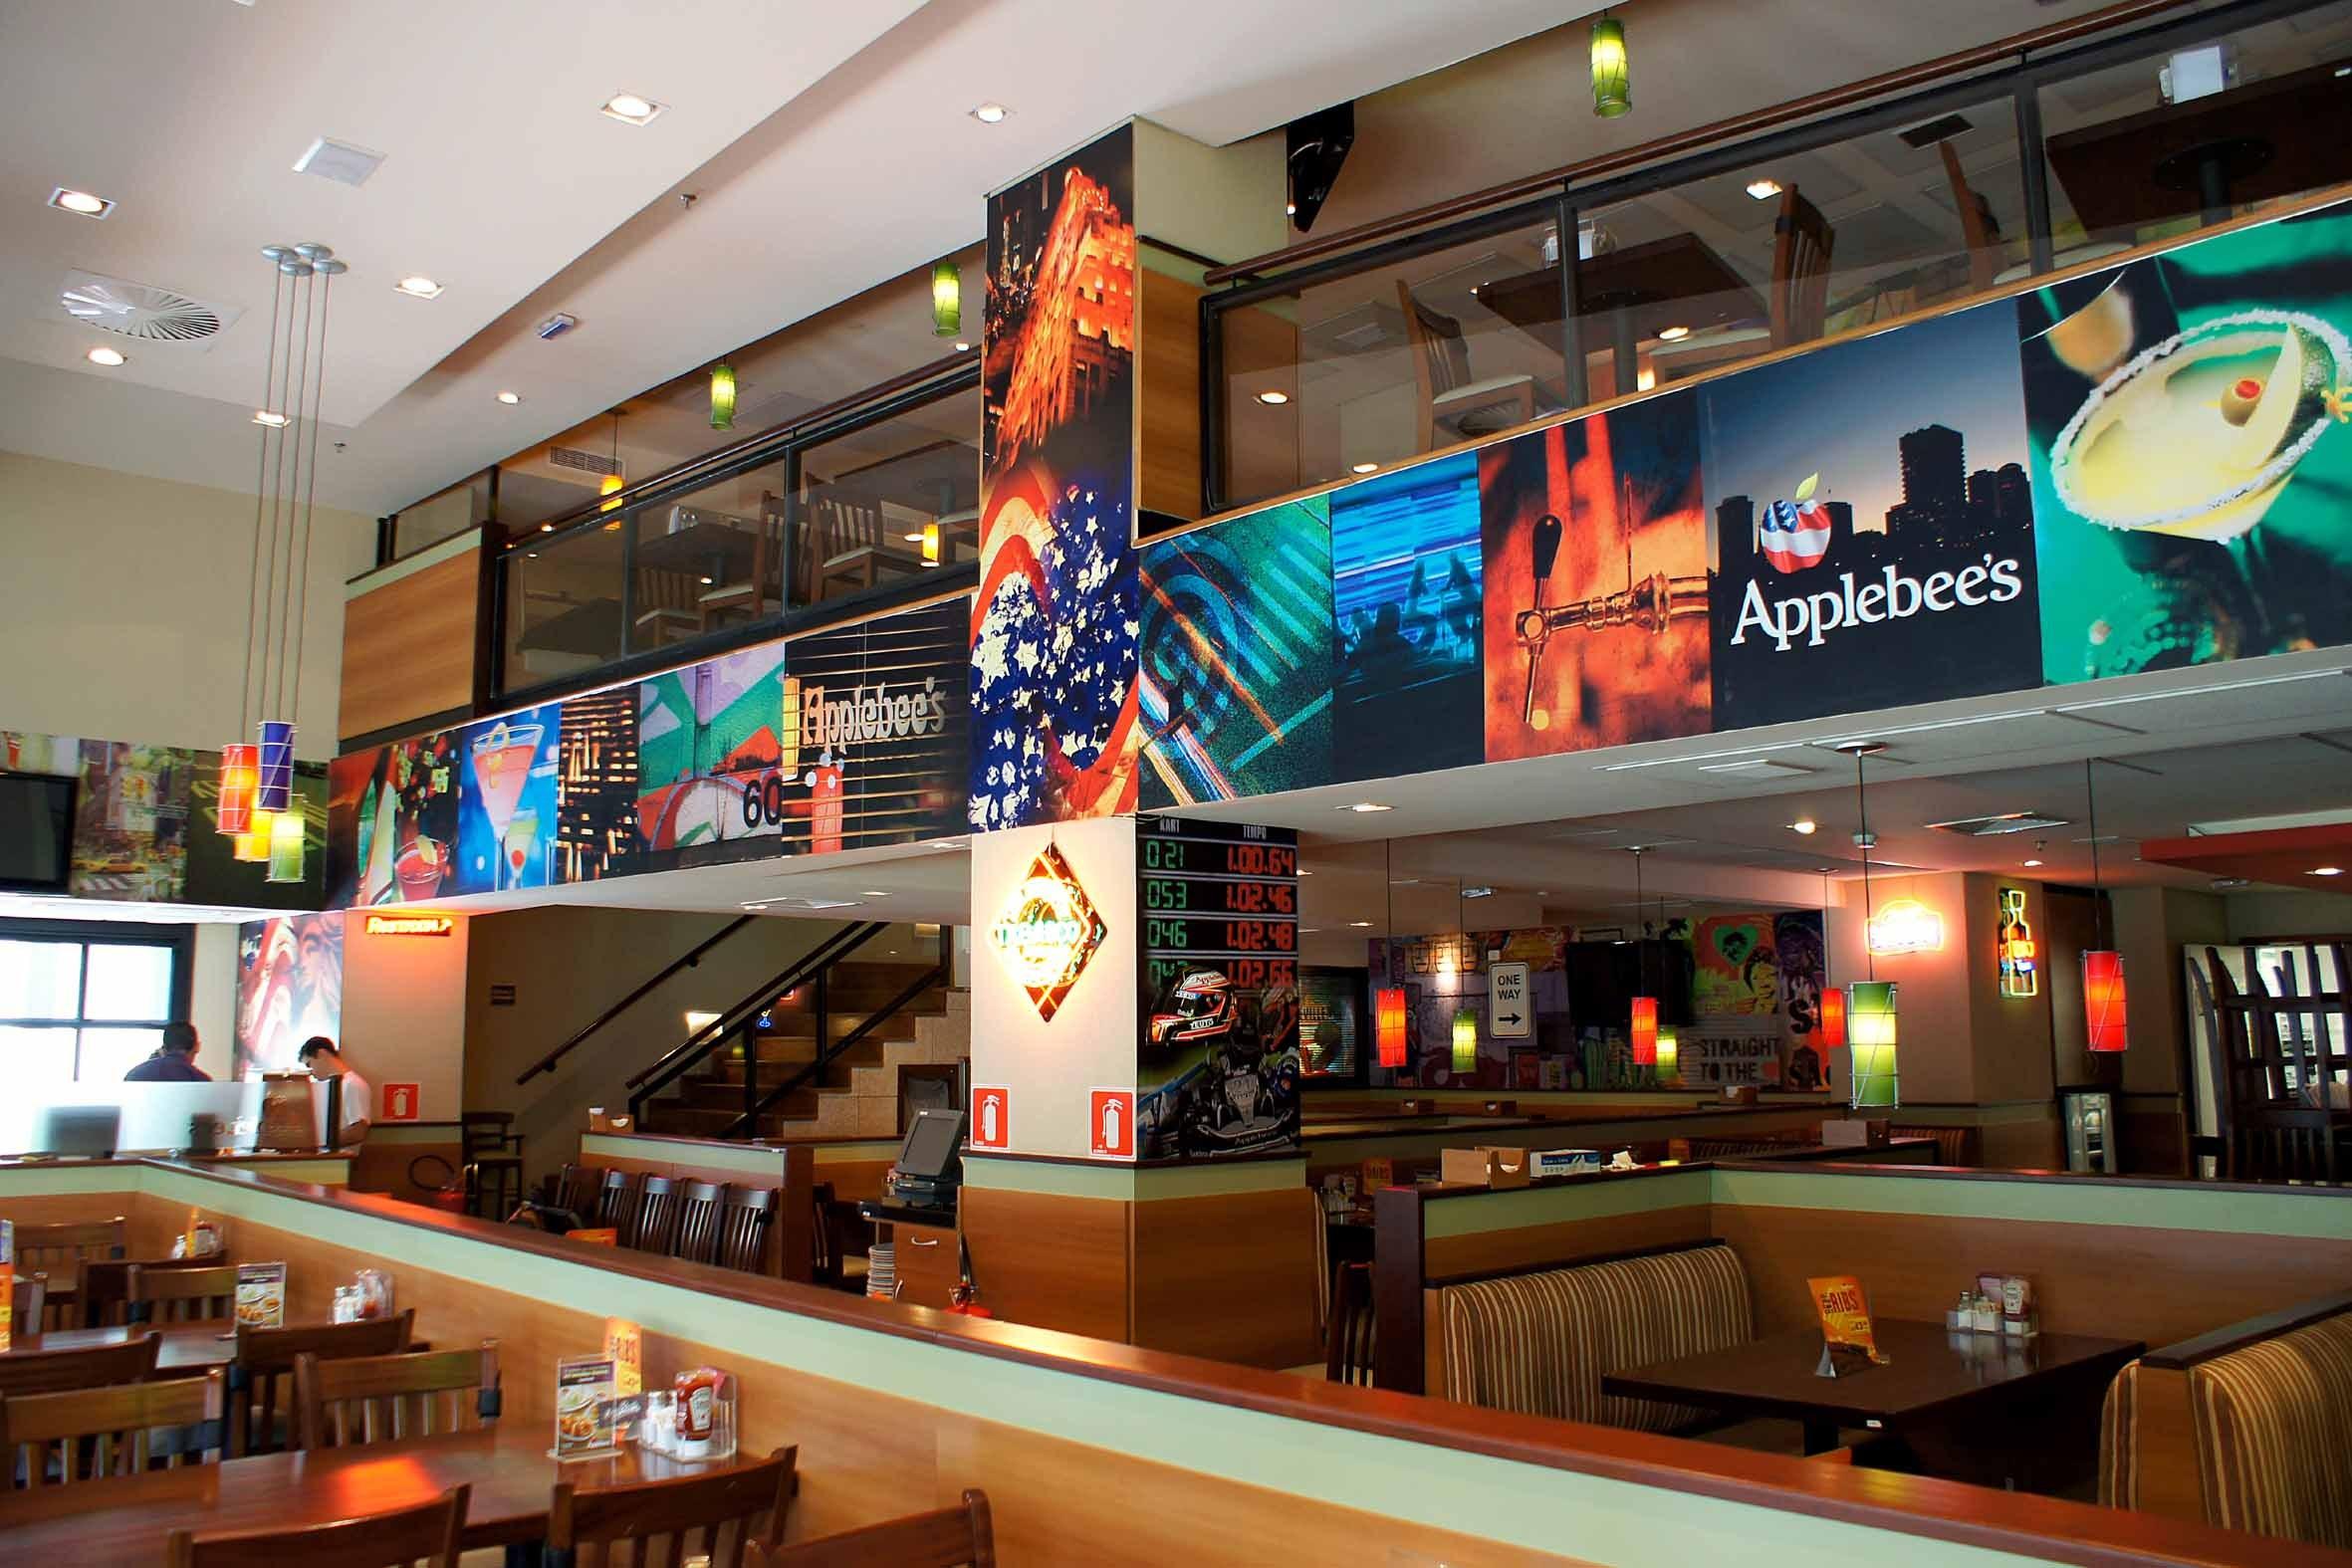 Anvisa Normas Para Restaurantes O Que Necessita Para Abrir O Seu